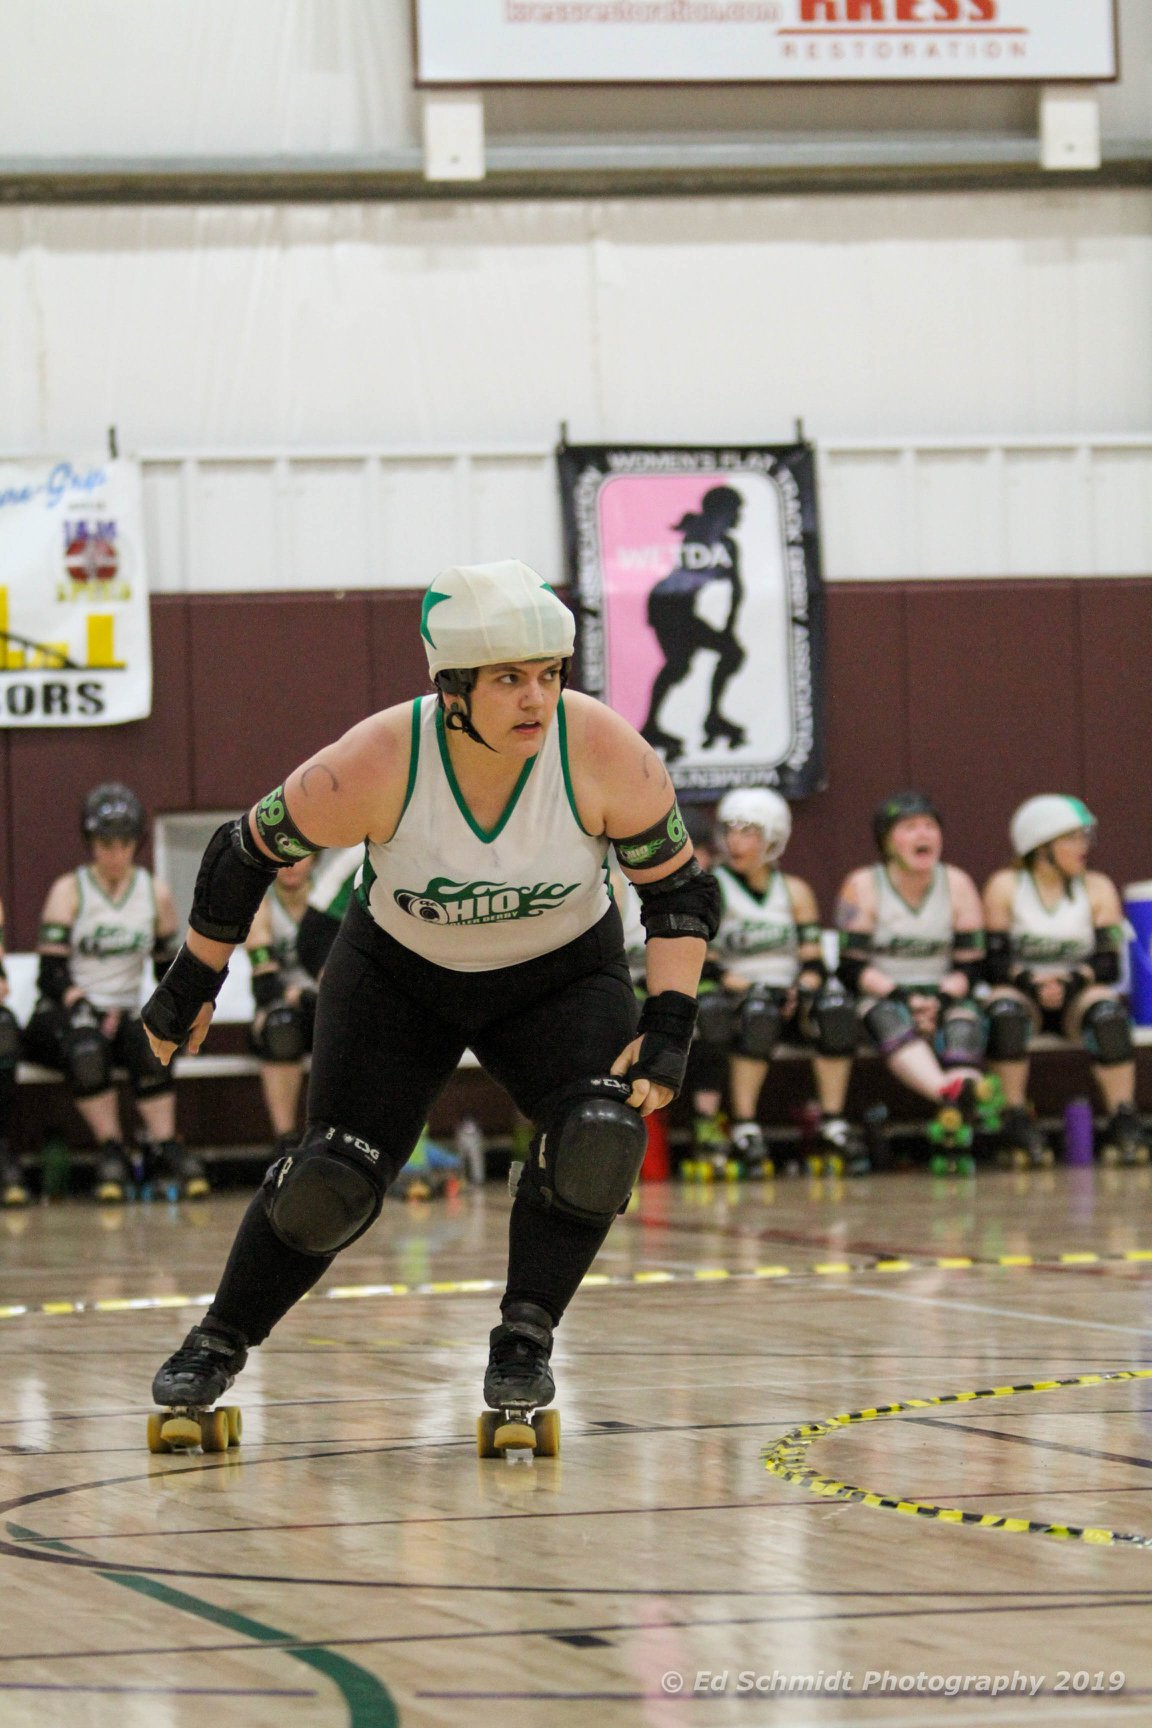 Rage jamming star pass GG v Beamers 5.18.19 Ed Schmidt Photography